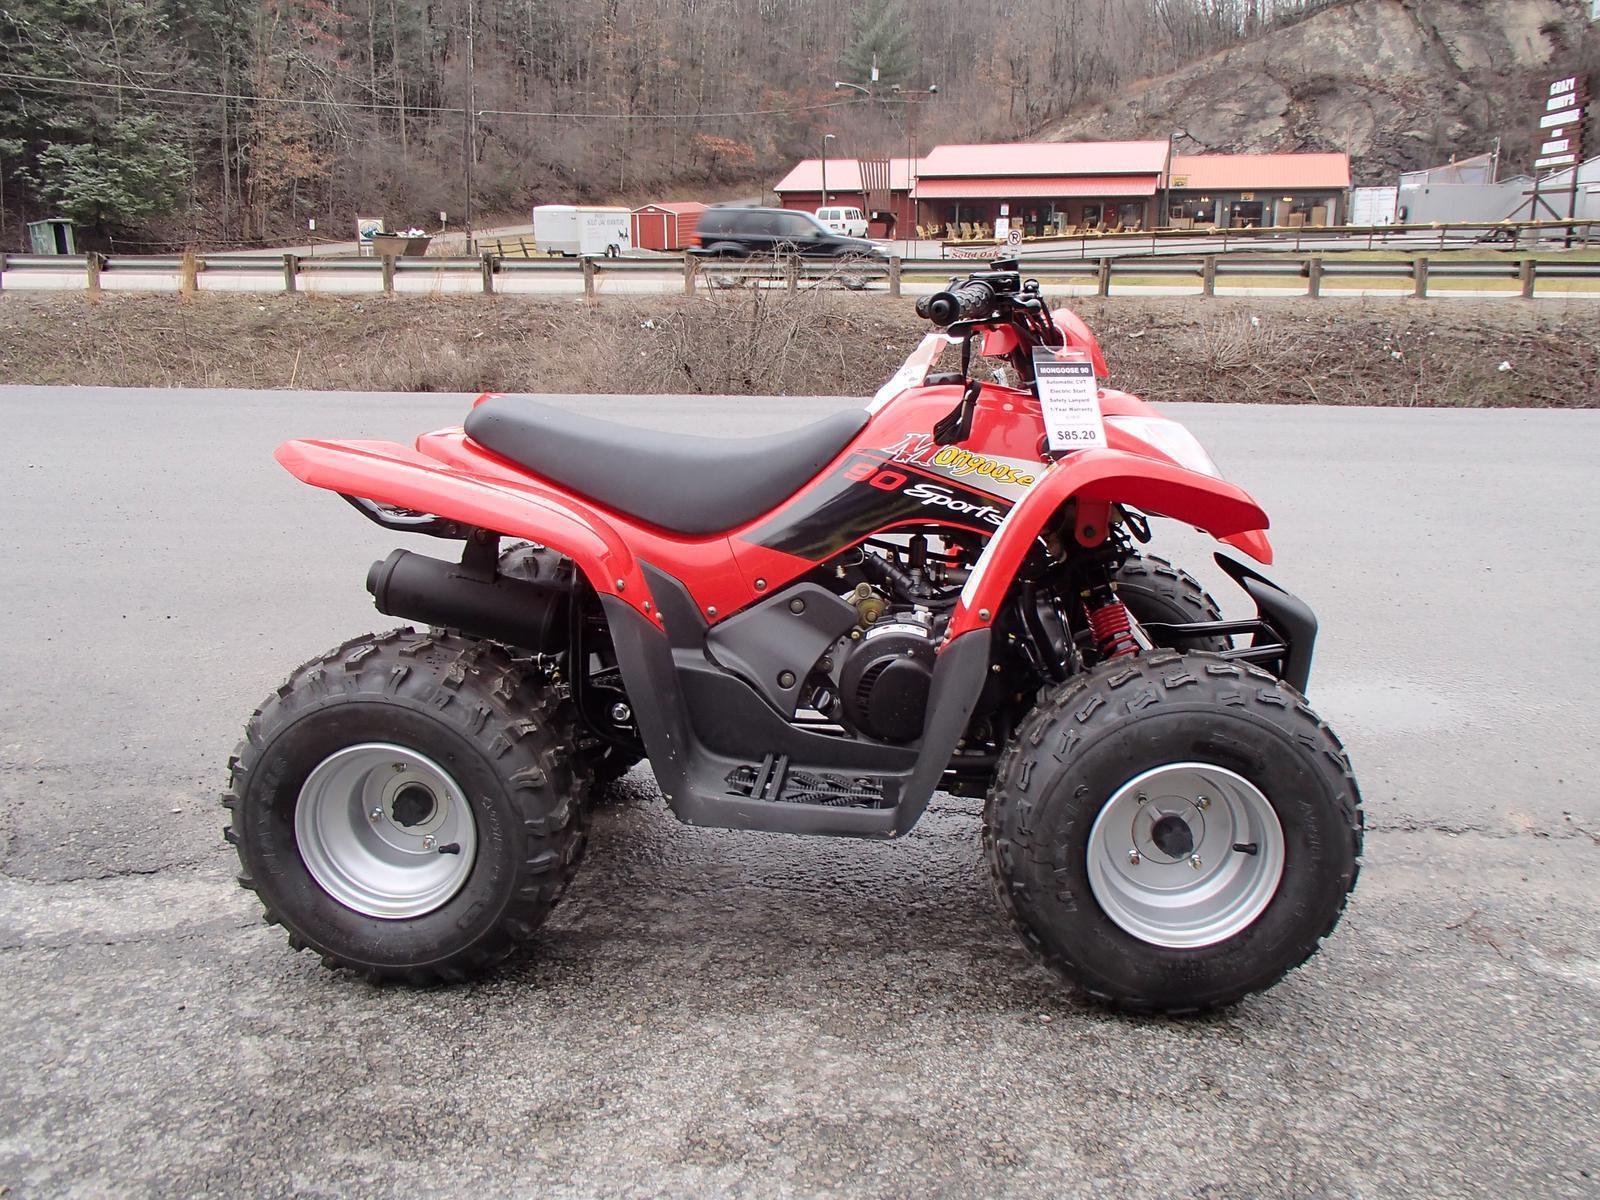 Inventory elkins motorsports elkins wv 304 636 7732 2012 mongoose 90 publicscrutiny Gallery